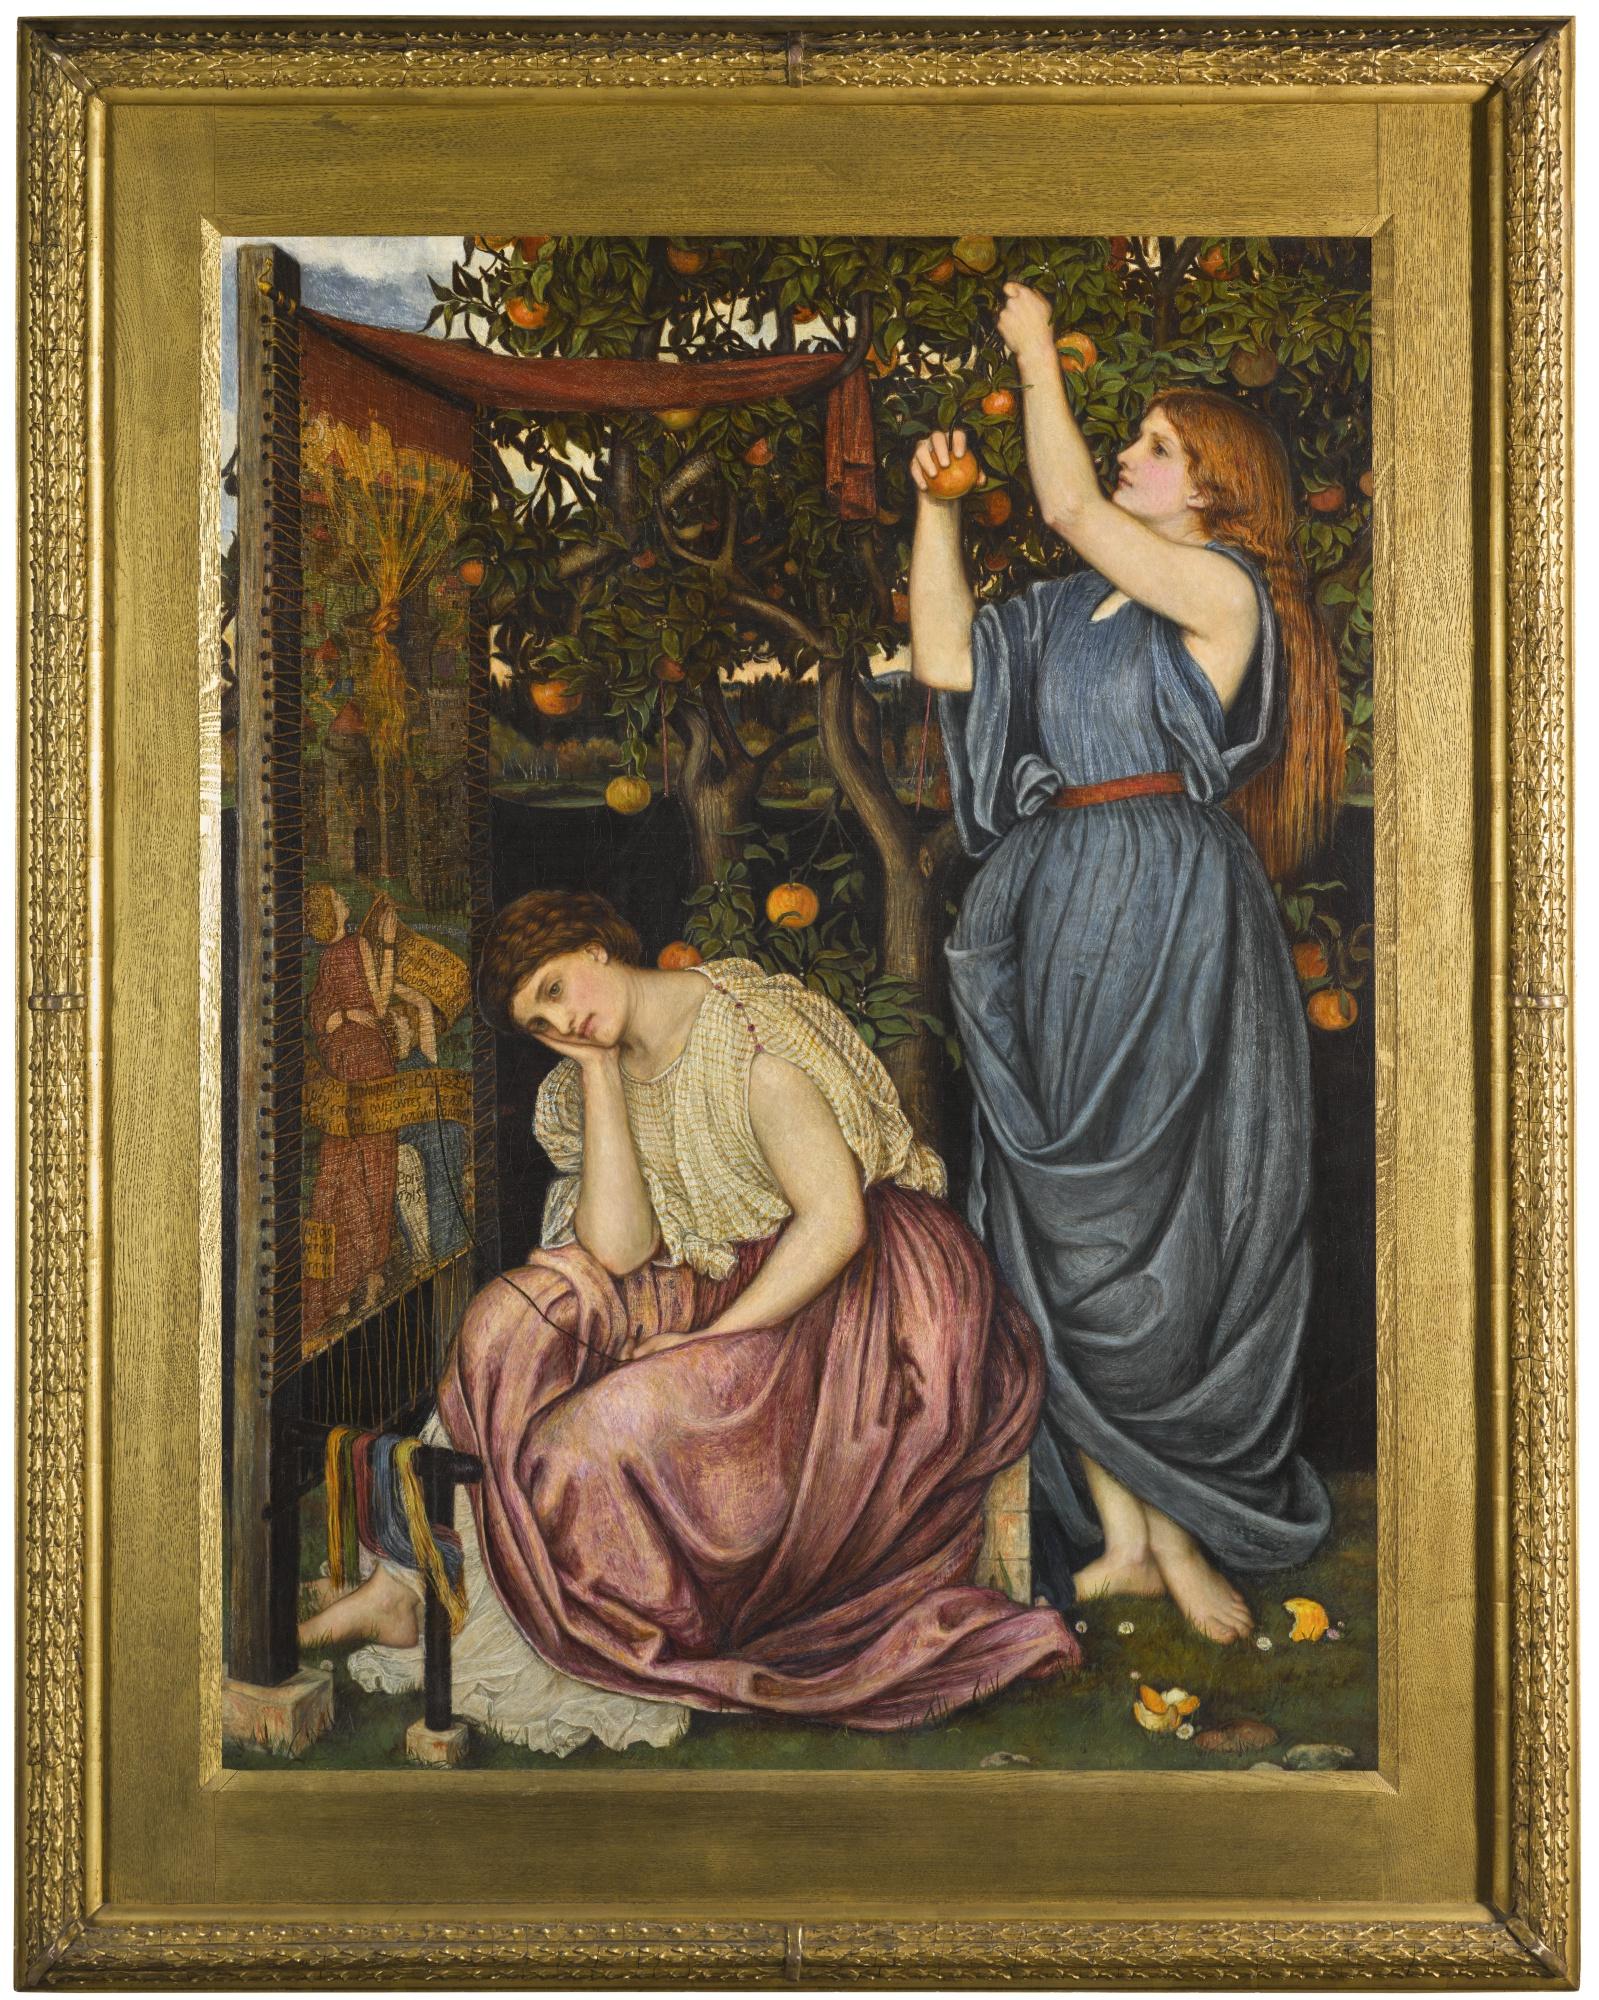 L'attesa di Penelope nel dipinto di Stanhope in asta a Londra